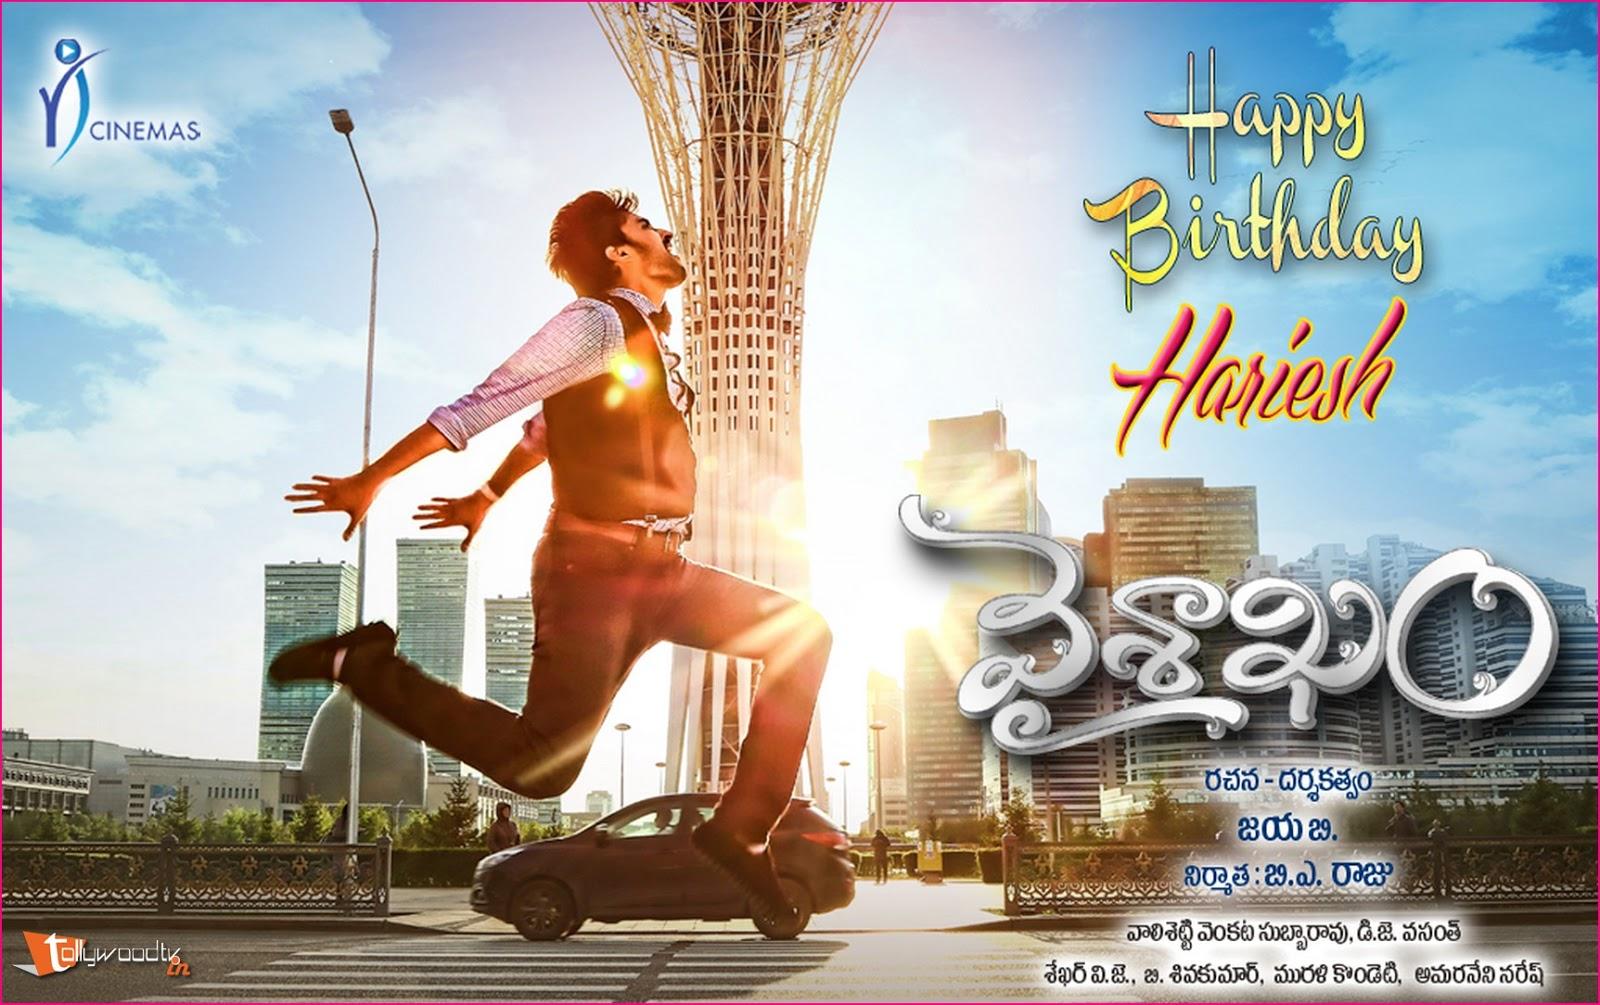 Hariesh Birthday Spl Posters-HQ-Photo-10